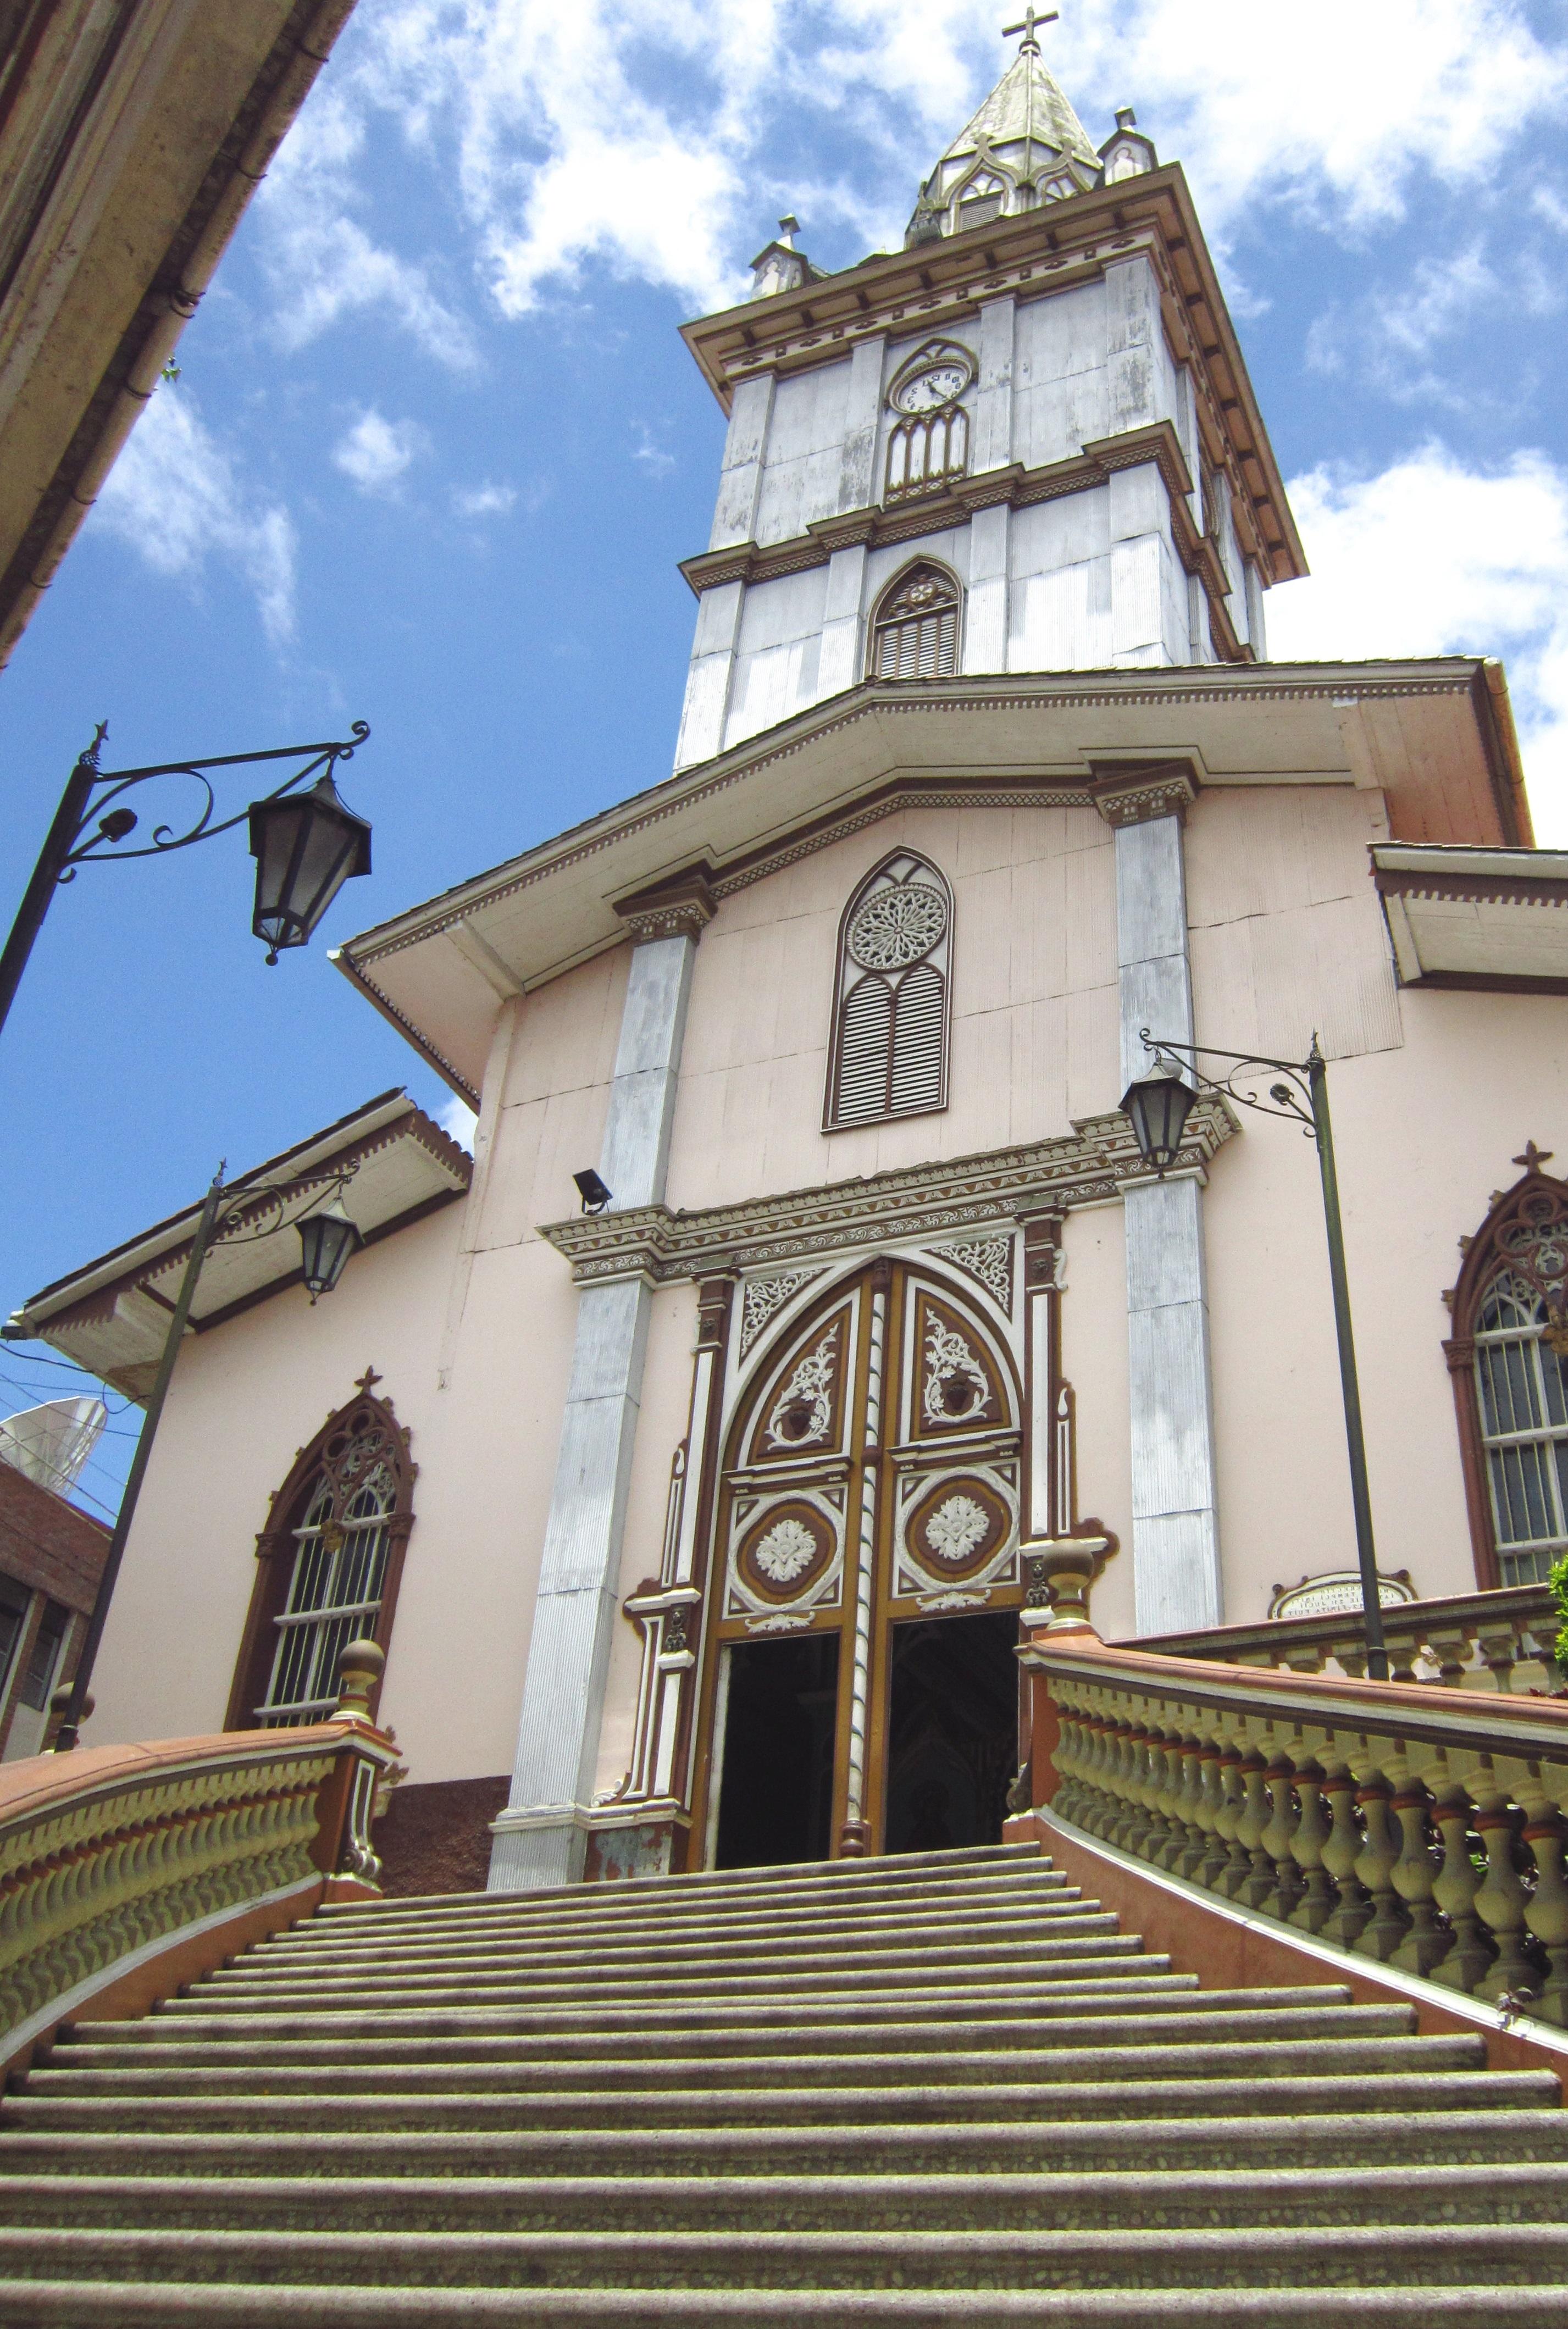 File:Iglesia de Zaruma, Ecuador.jpg - Wikimedia Commons